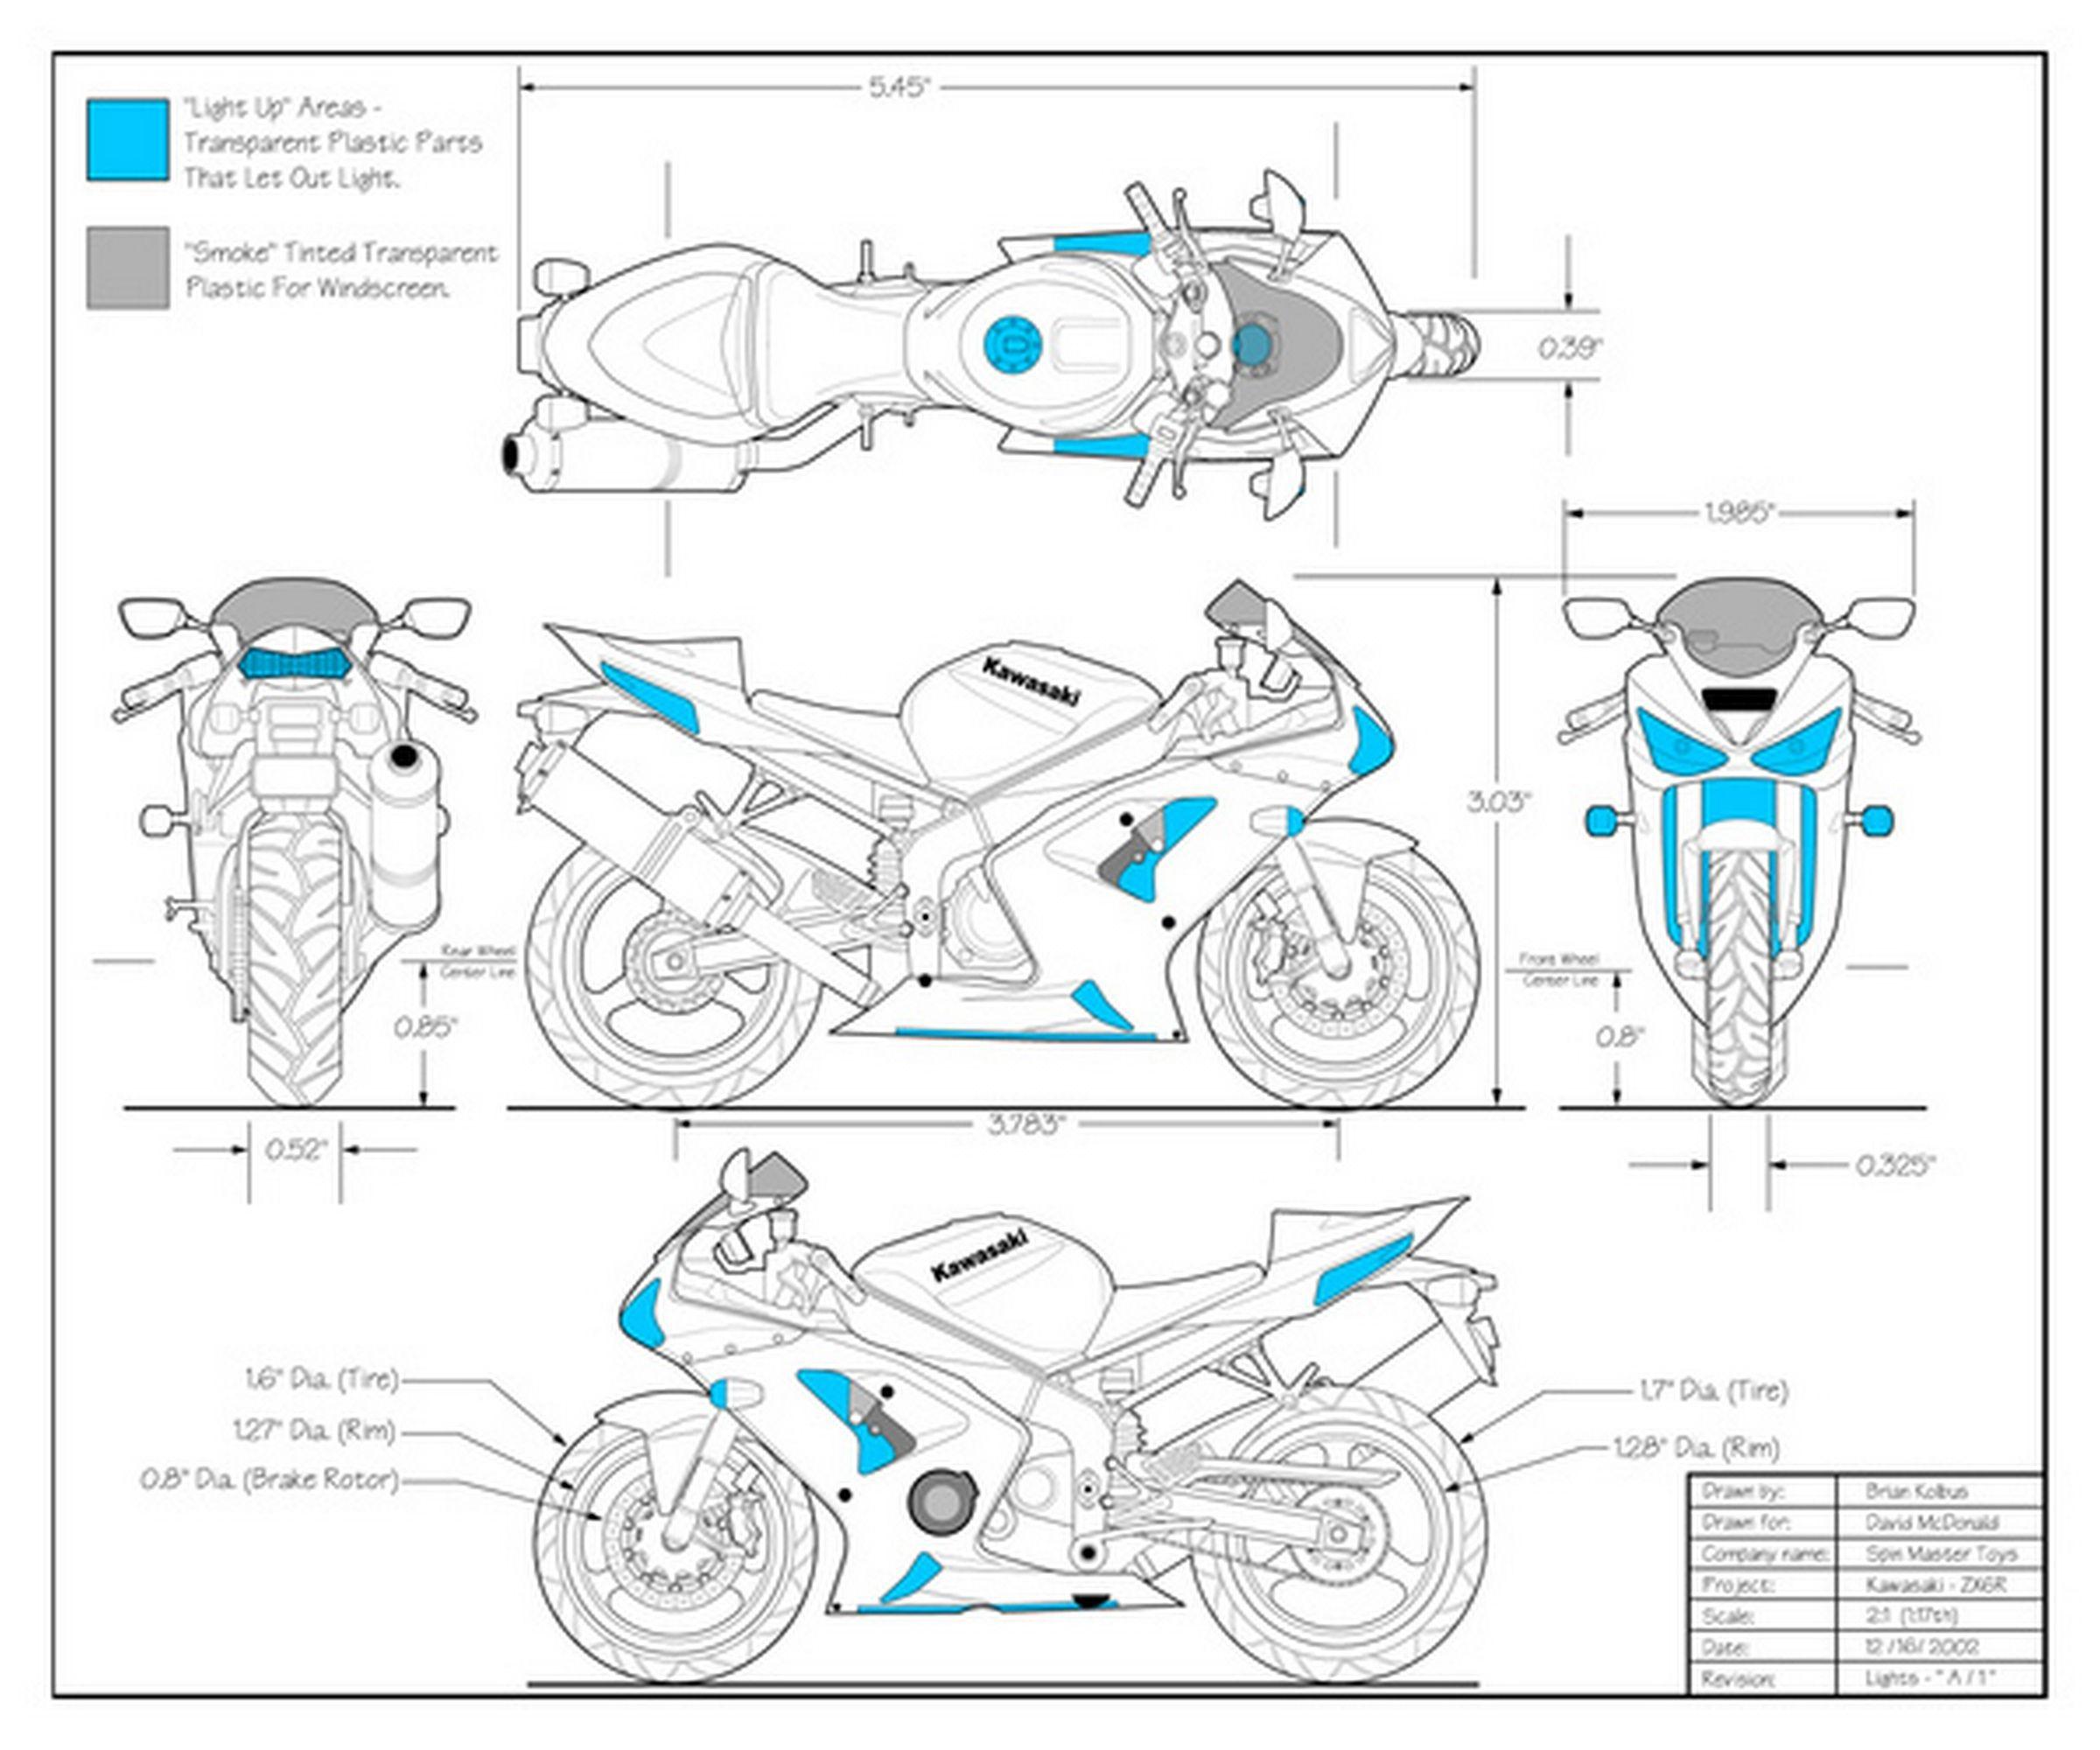 Kawasaki zx6r 636 2004 blueprints model sheet pinterest kawasaki zx6r 636 2004 blueprints malvernweather Gallery